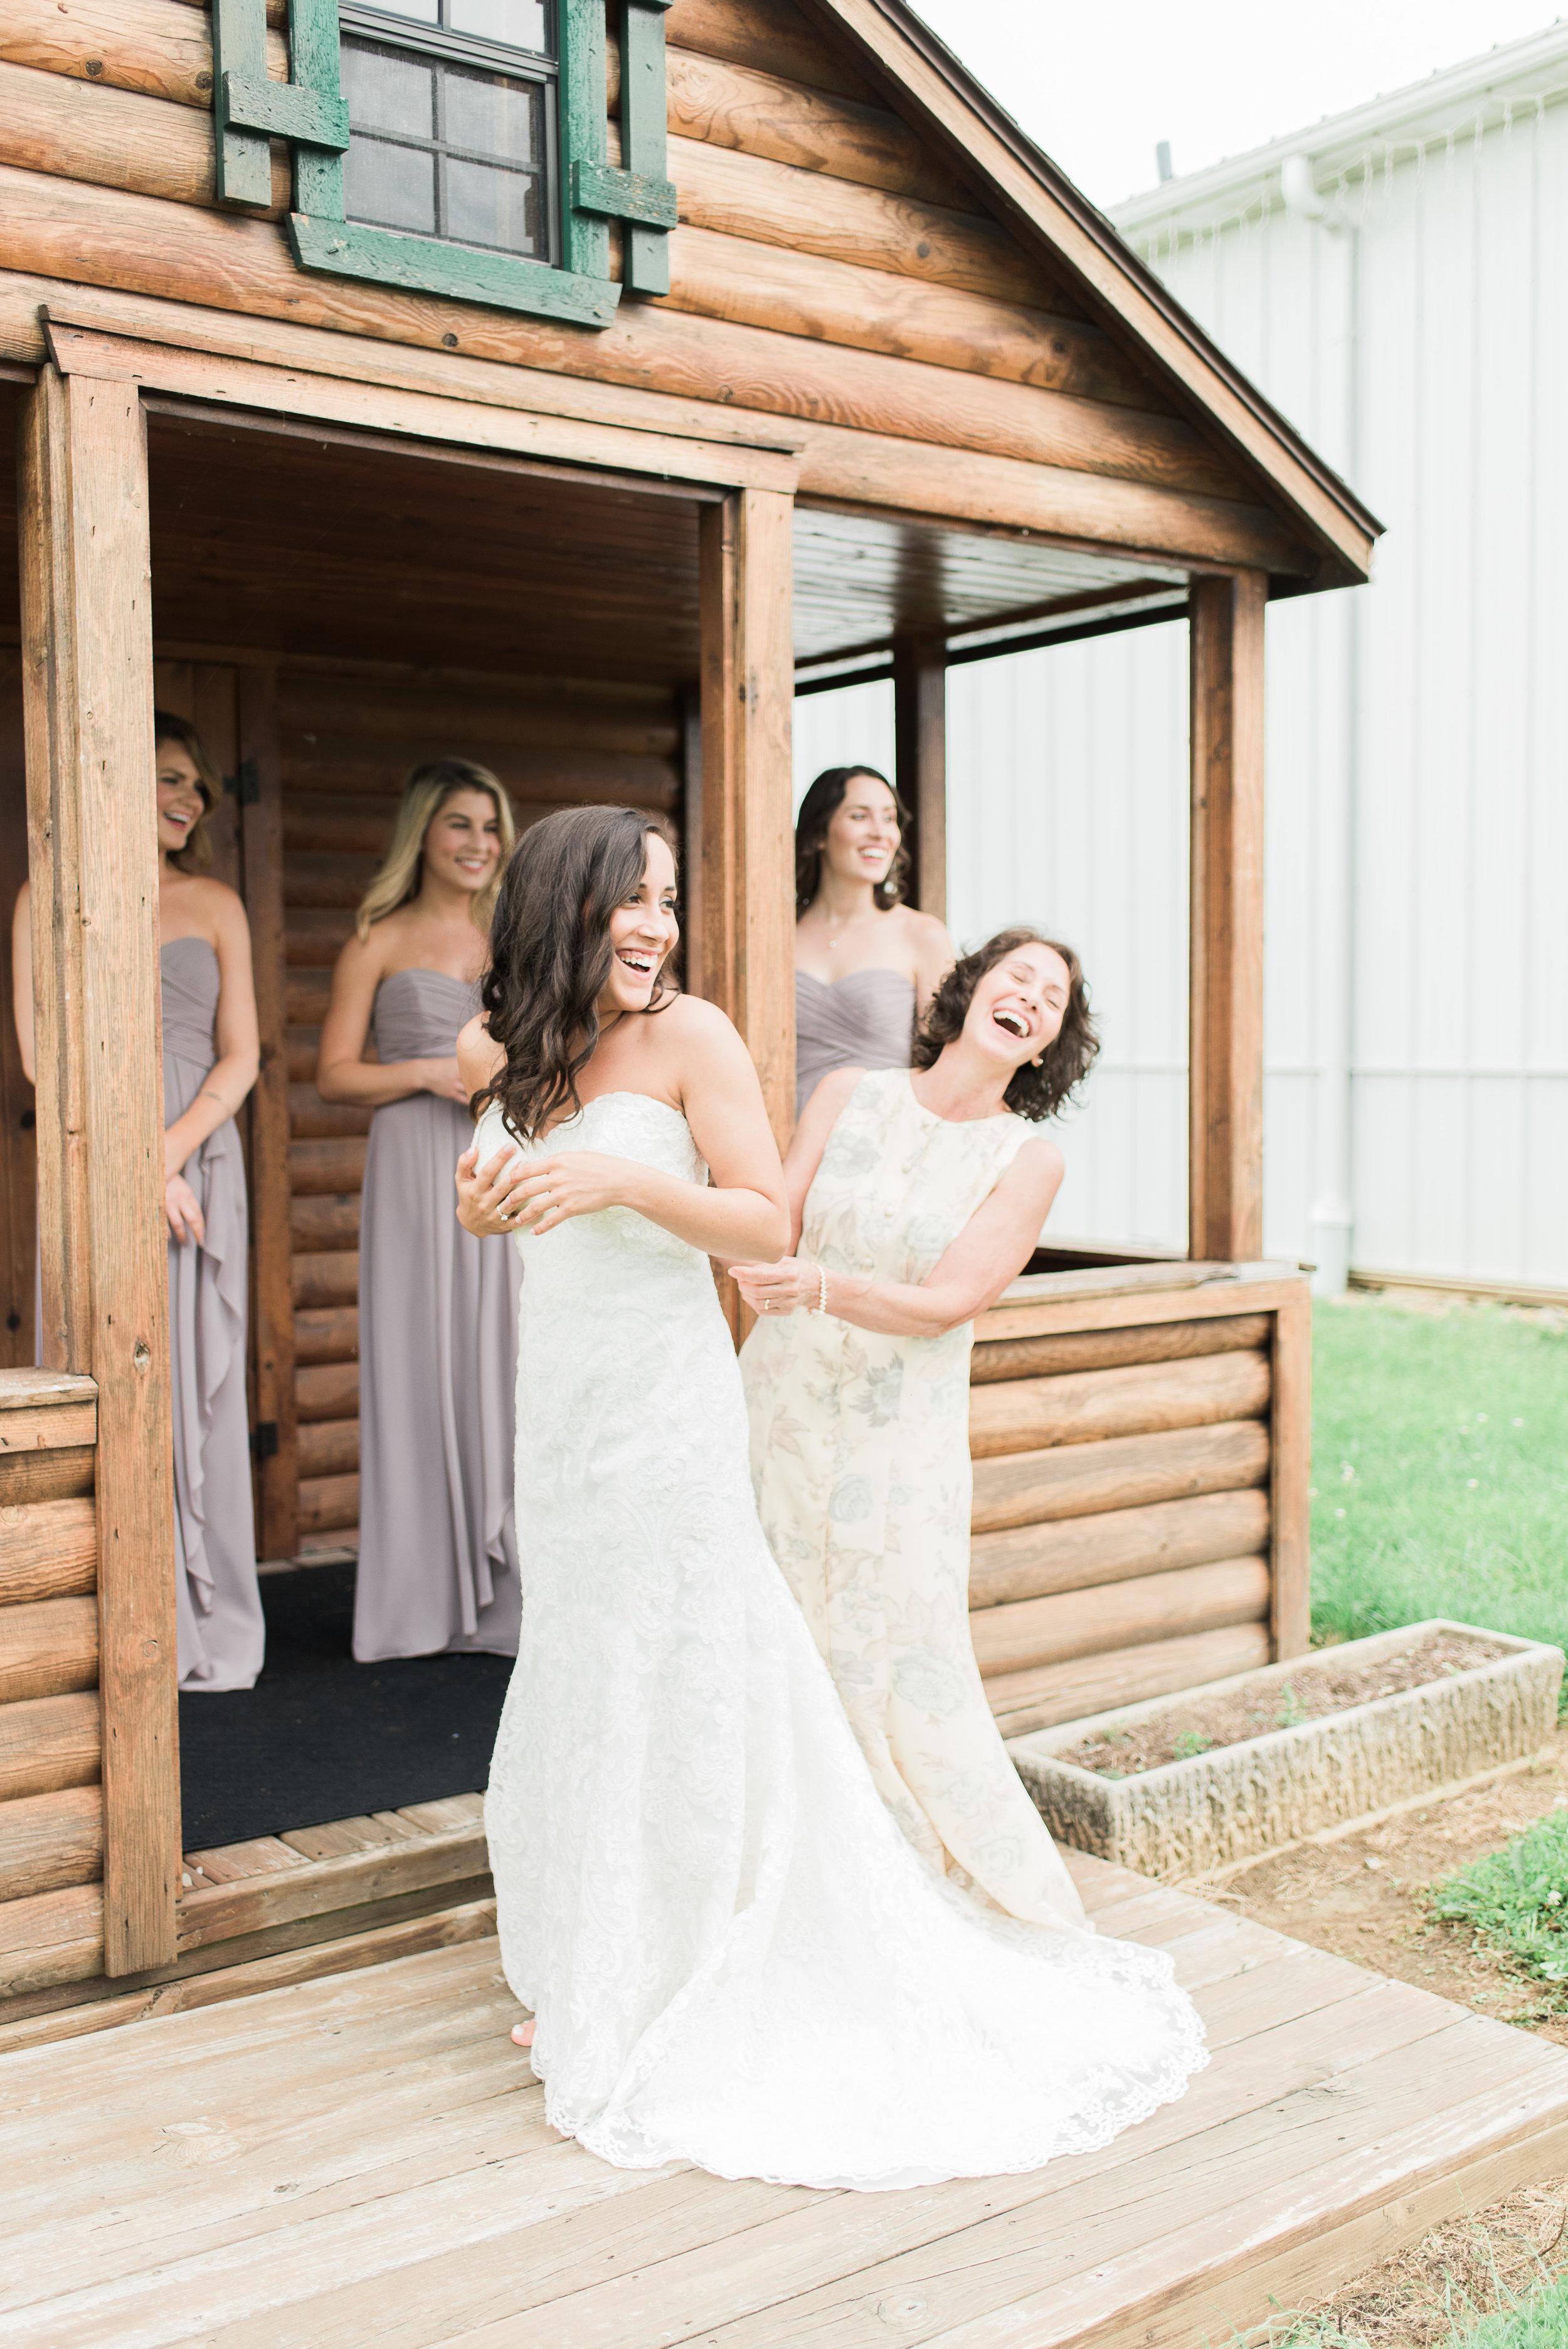 sarah-marcus-married-83 copy.jpg